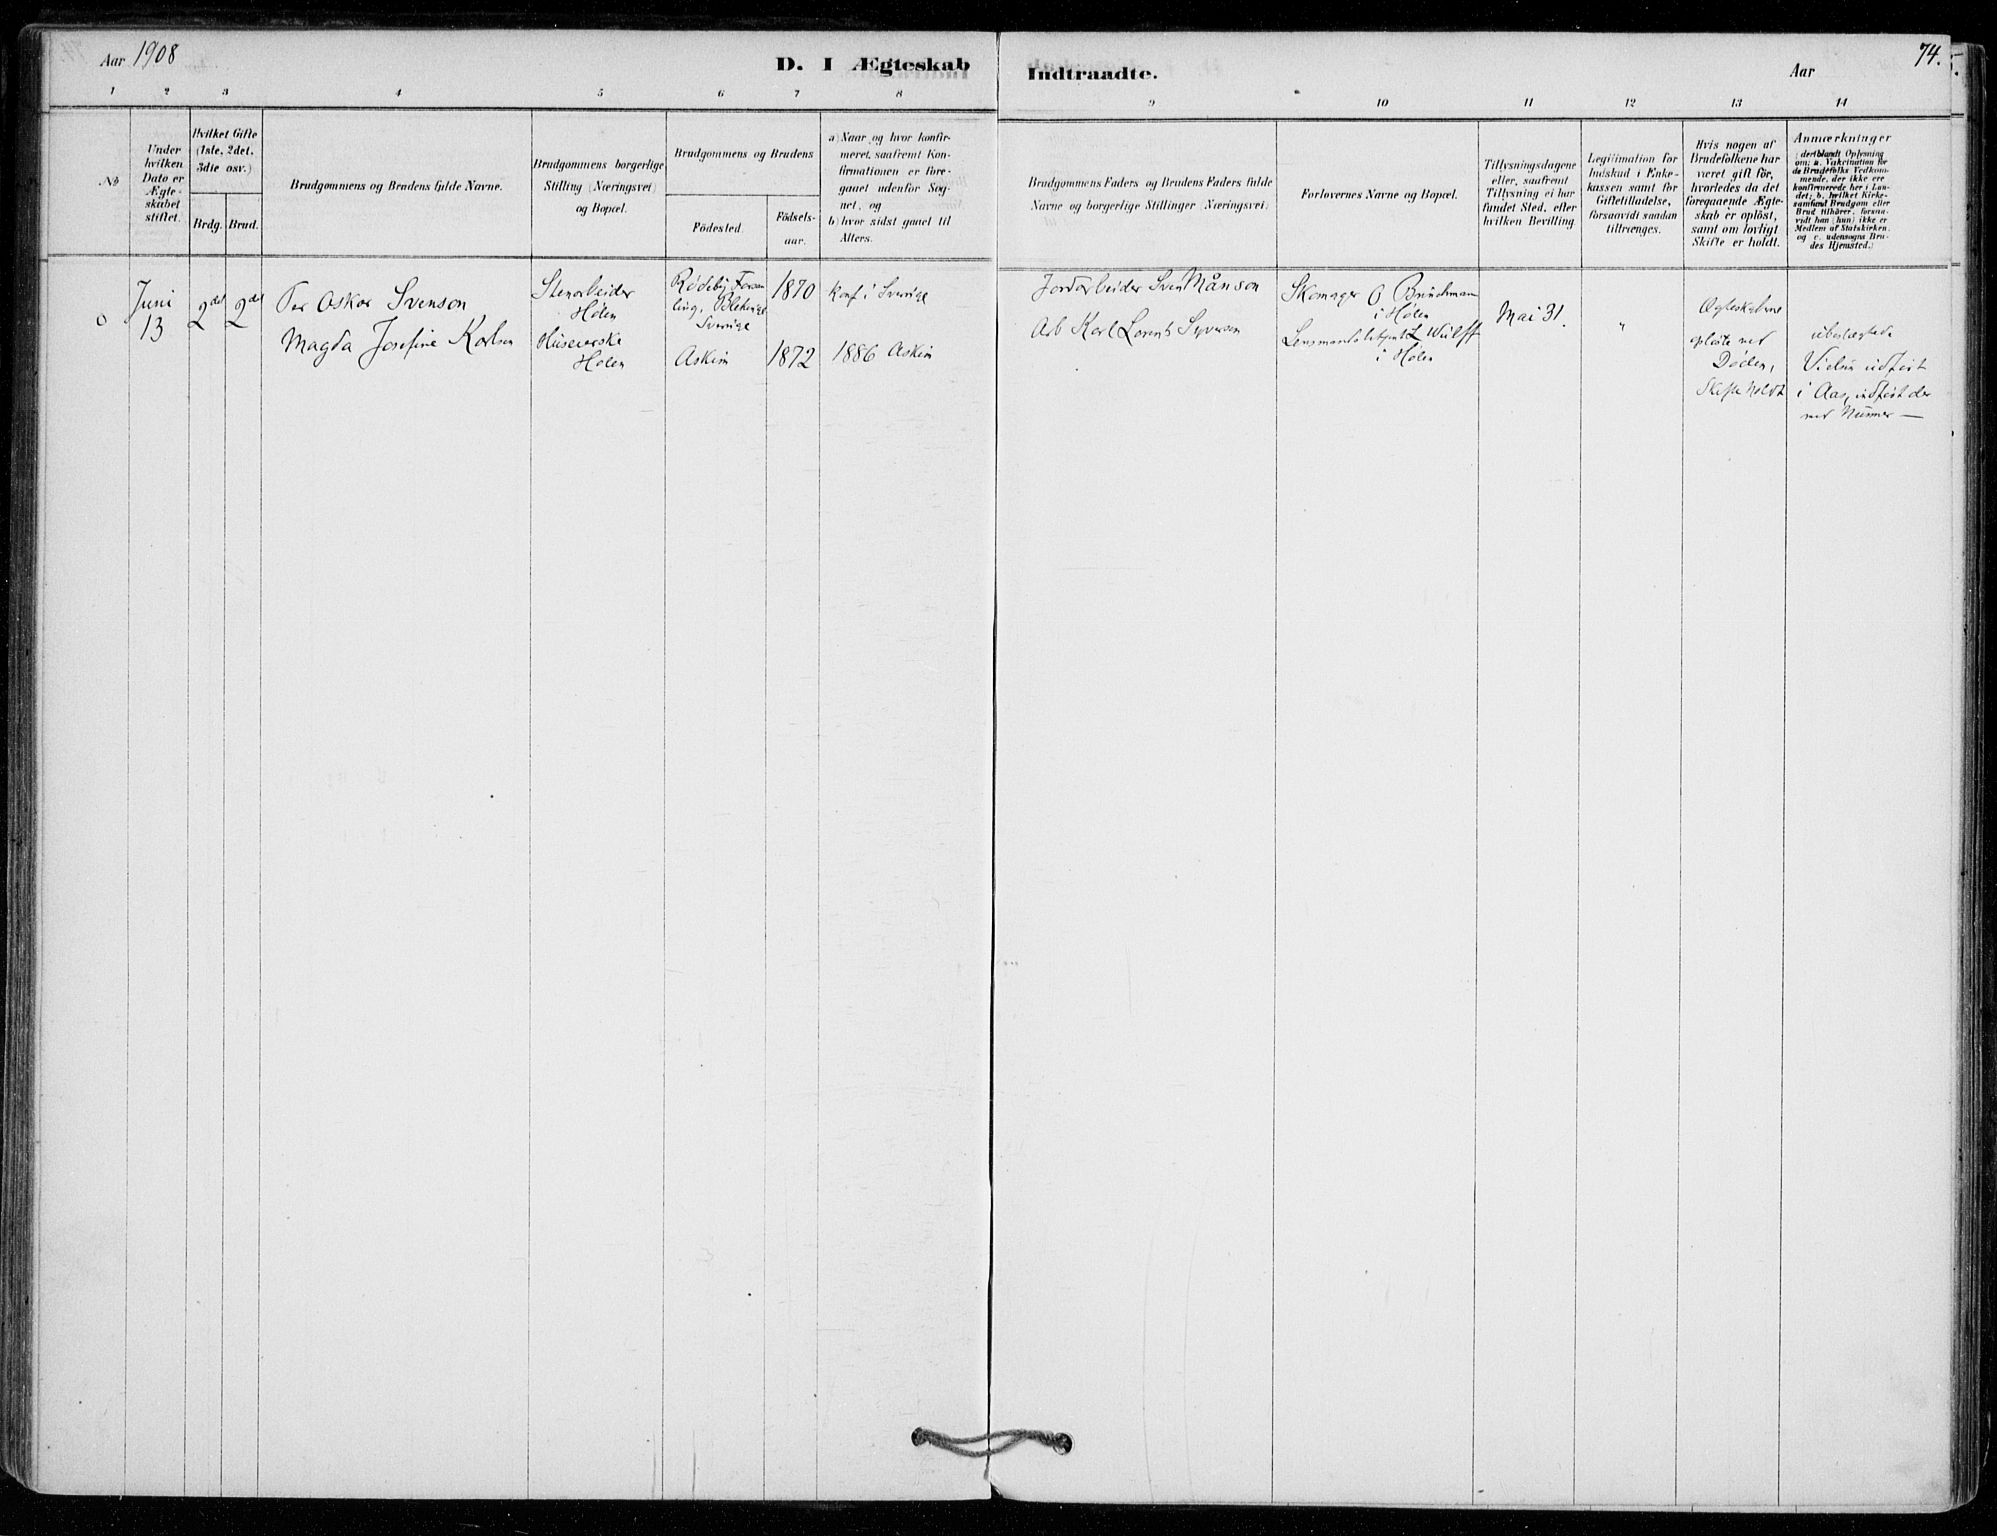 SAO, Vestby prestekontor Kirkebøker, F/Fe/L0001: Ministerialbok nr. V 1, 1878-1931, s. 74